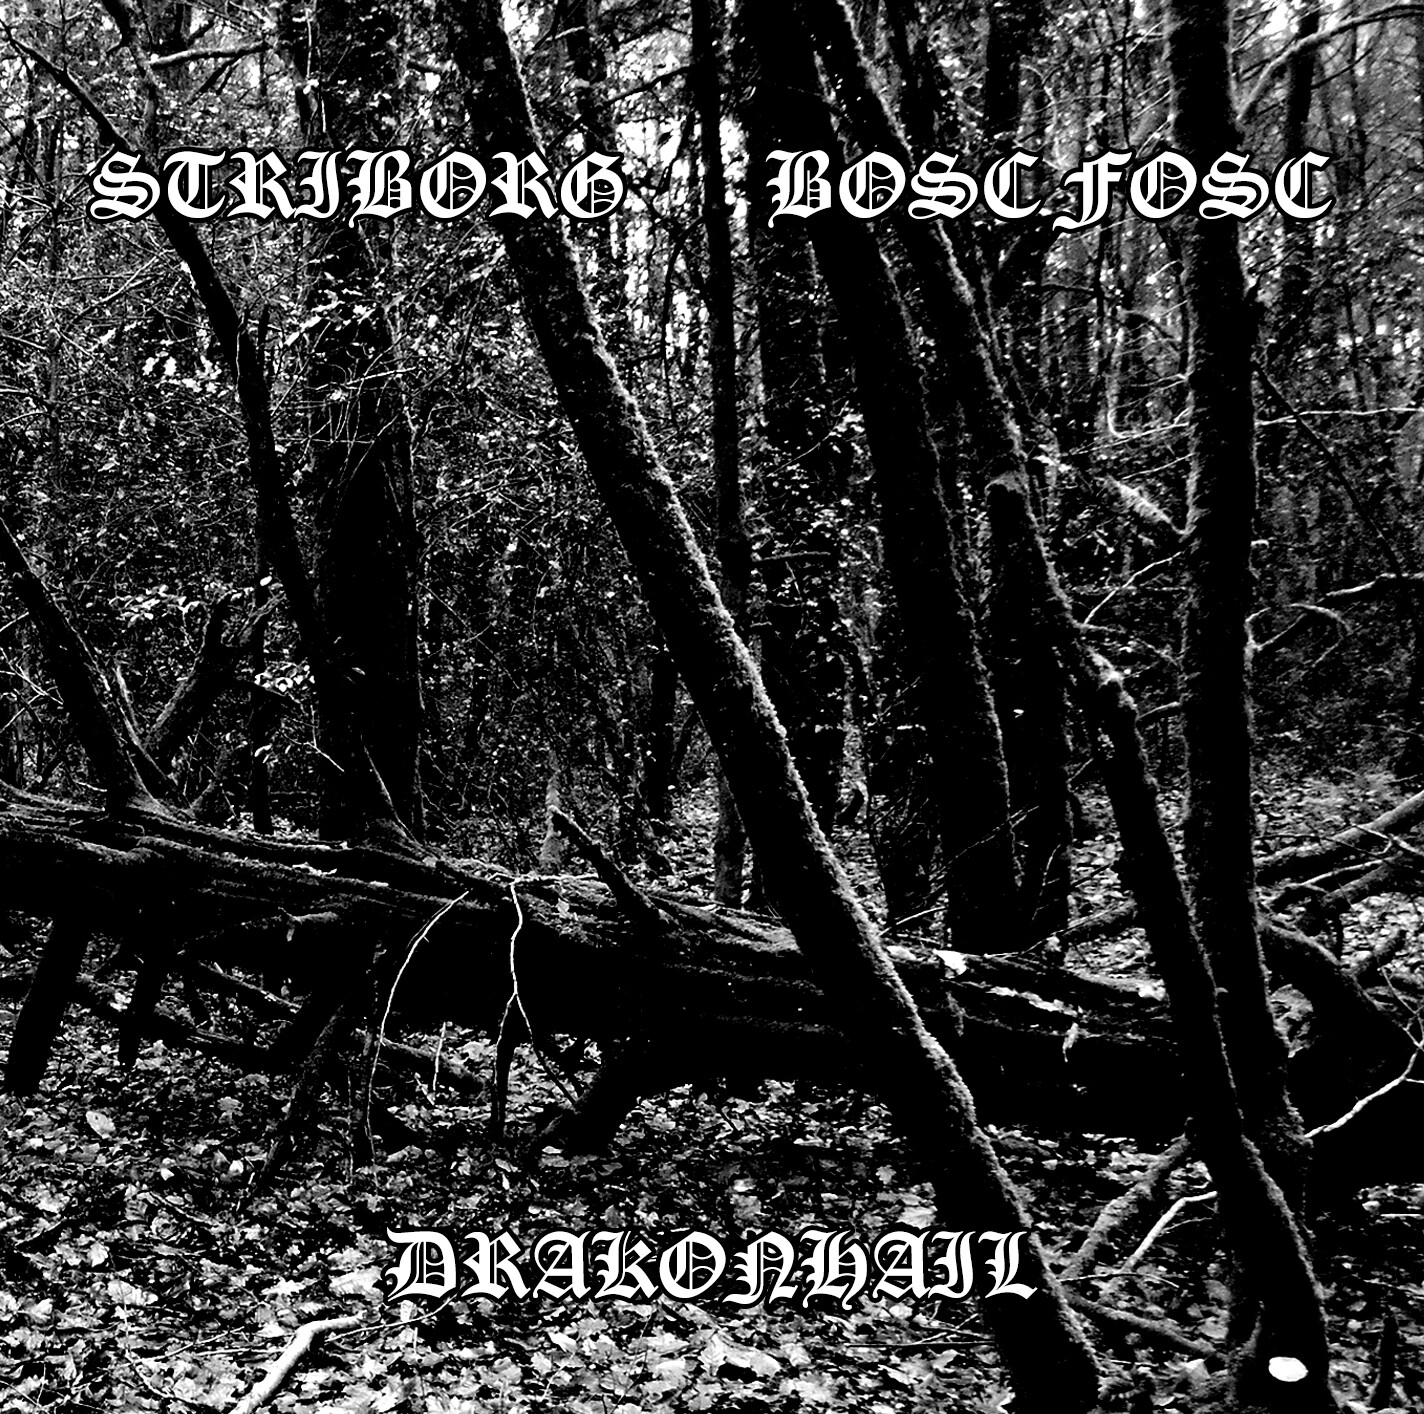 STRIBORG / BOSC FOSC / DRAKONHAIL - Split